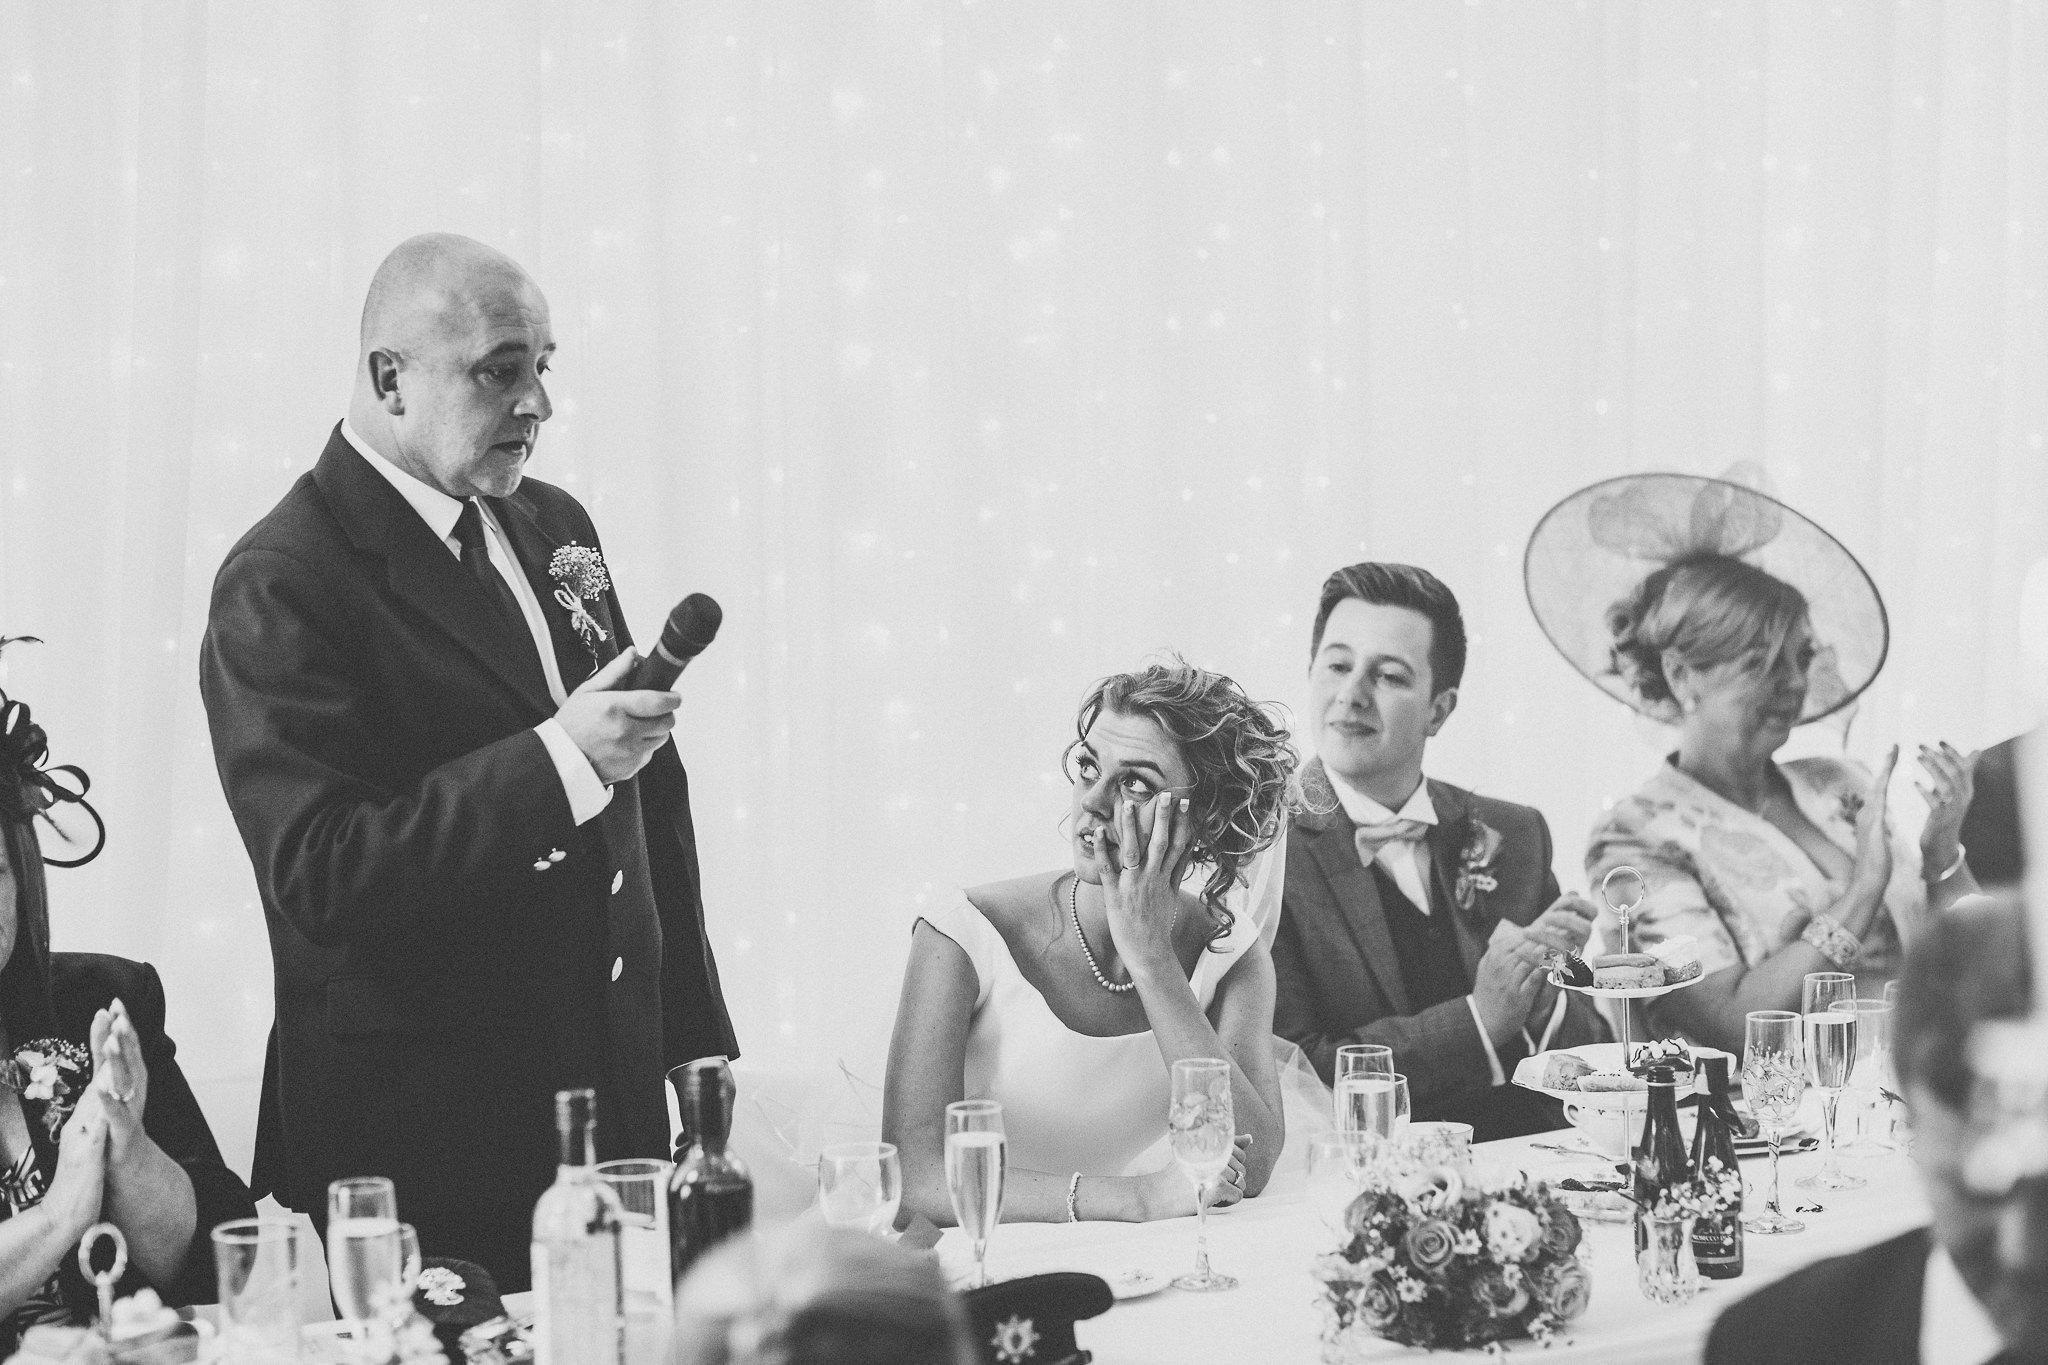 Lancashire-Creative-natural-documentary-wedding-photography-90066